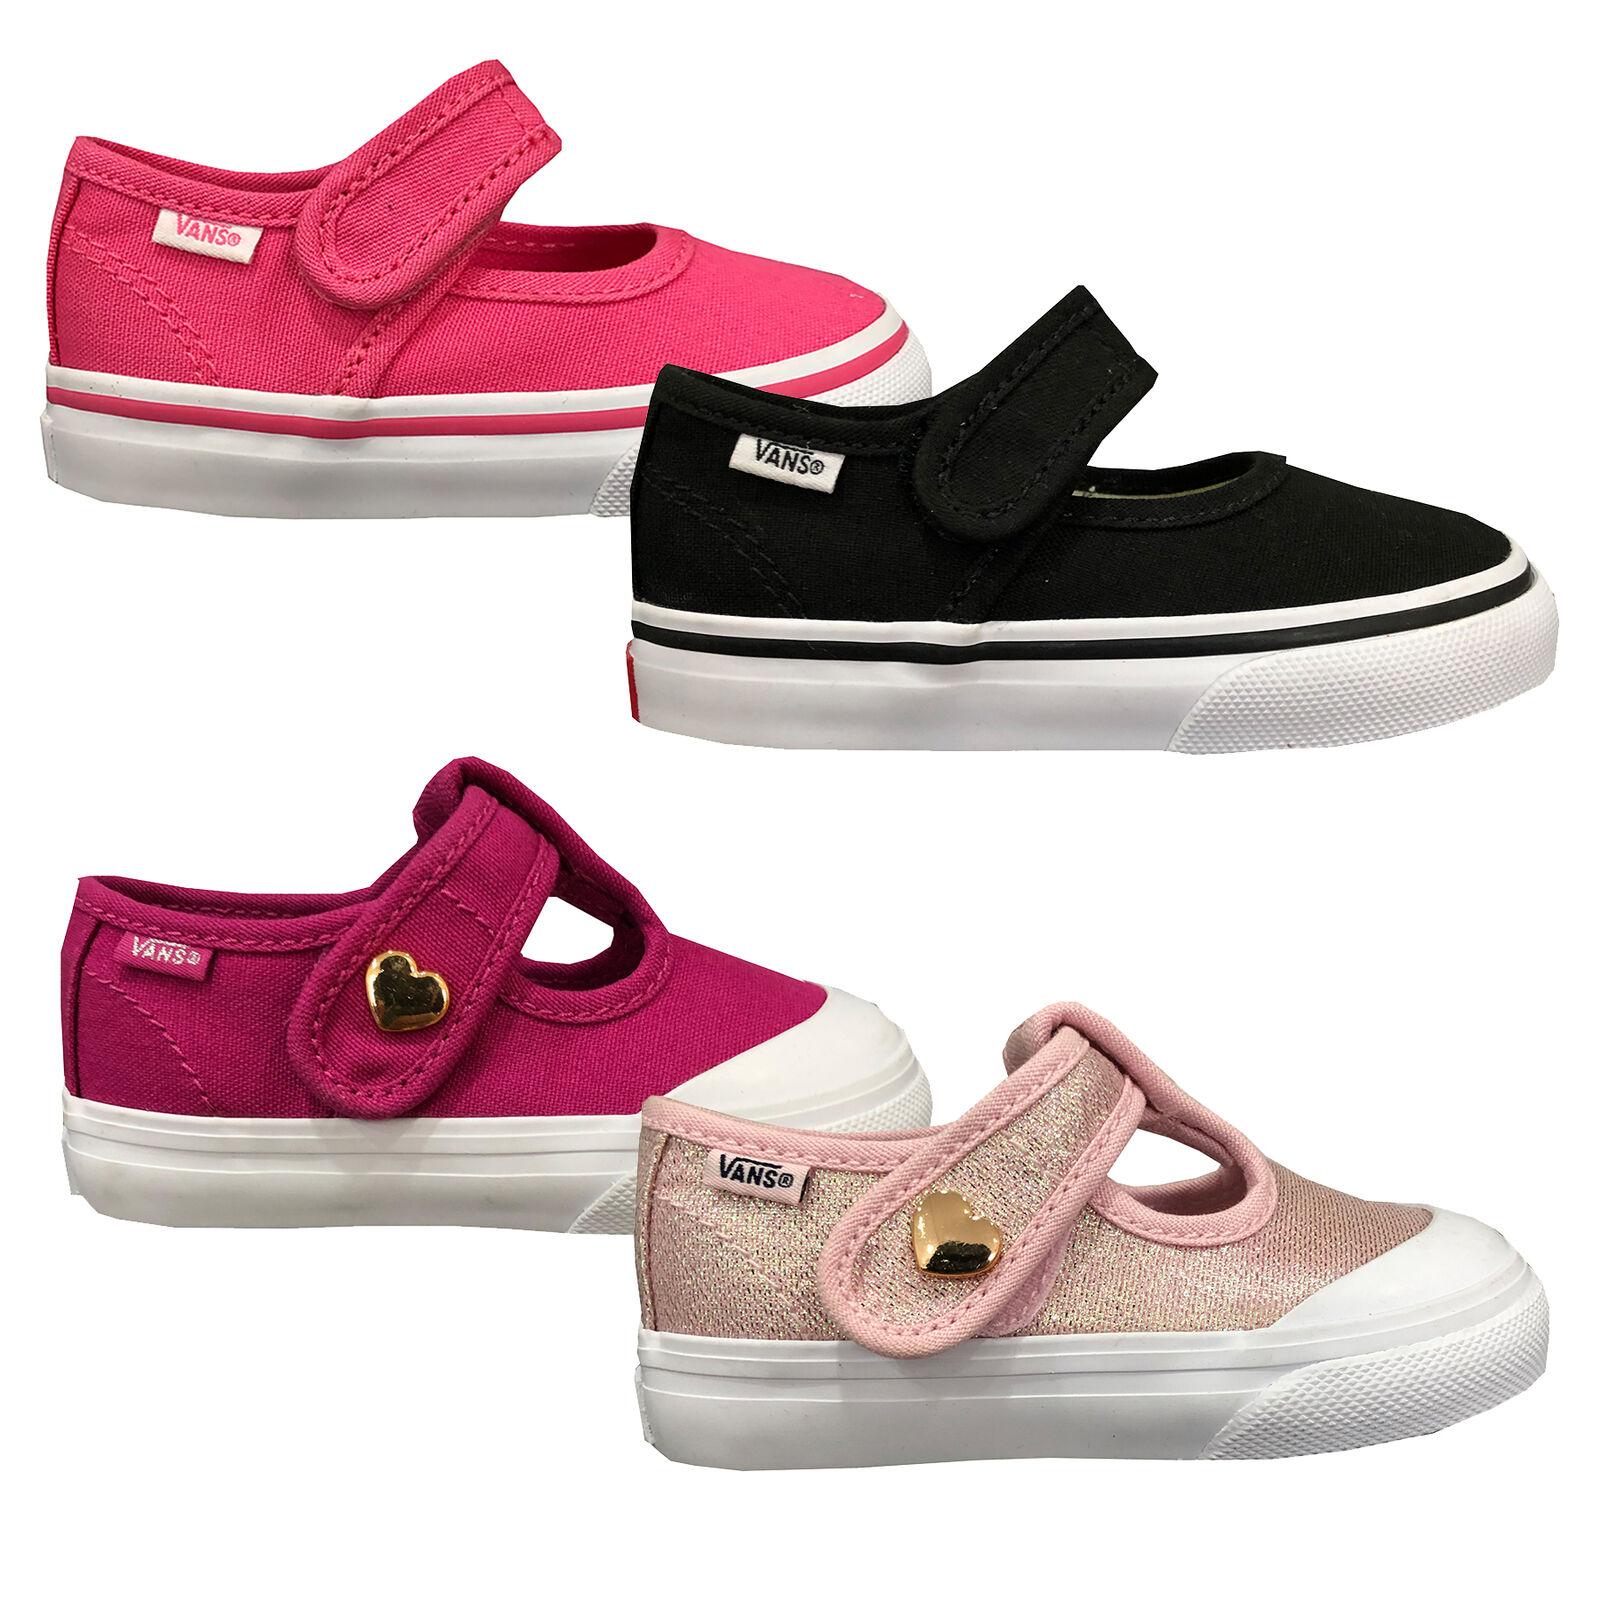 VANS Sk8 hi Zip Kinder SCHUHE Sneaker Pink Glitter Gr. EUR 27